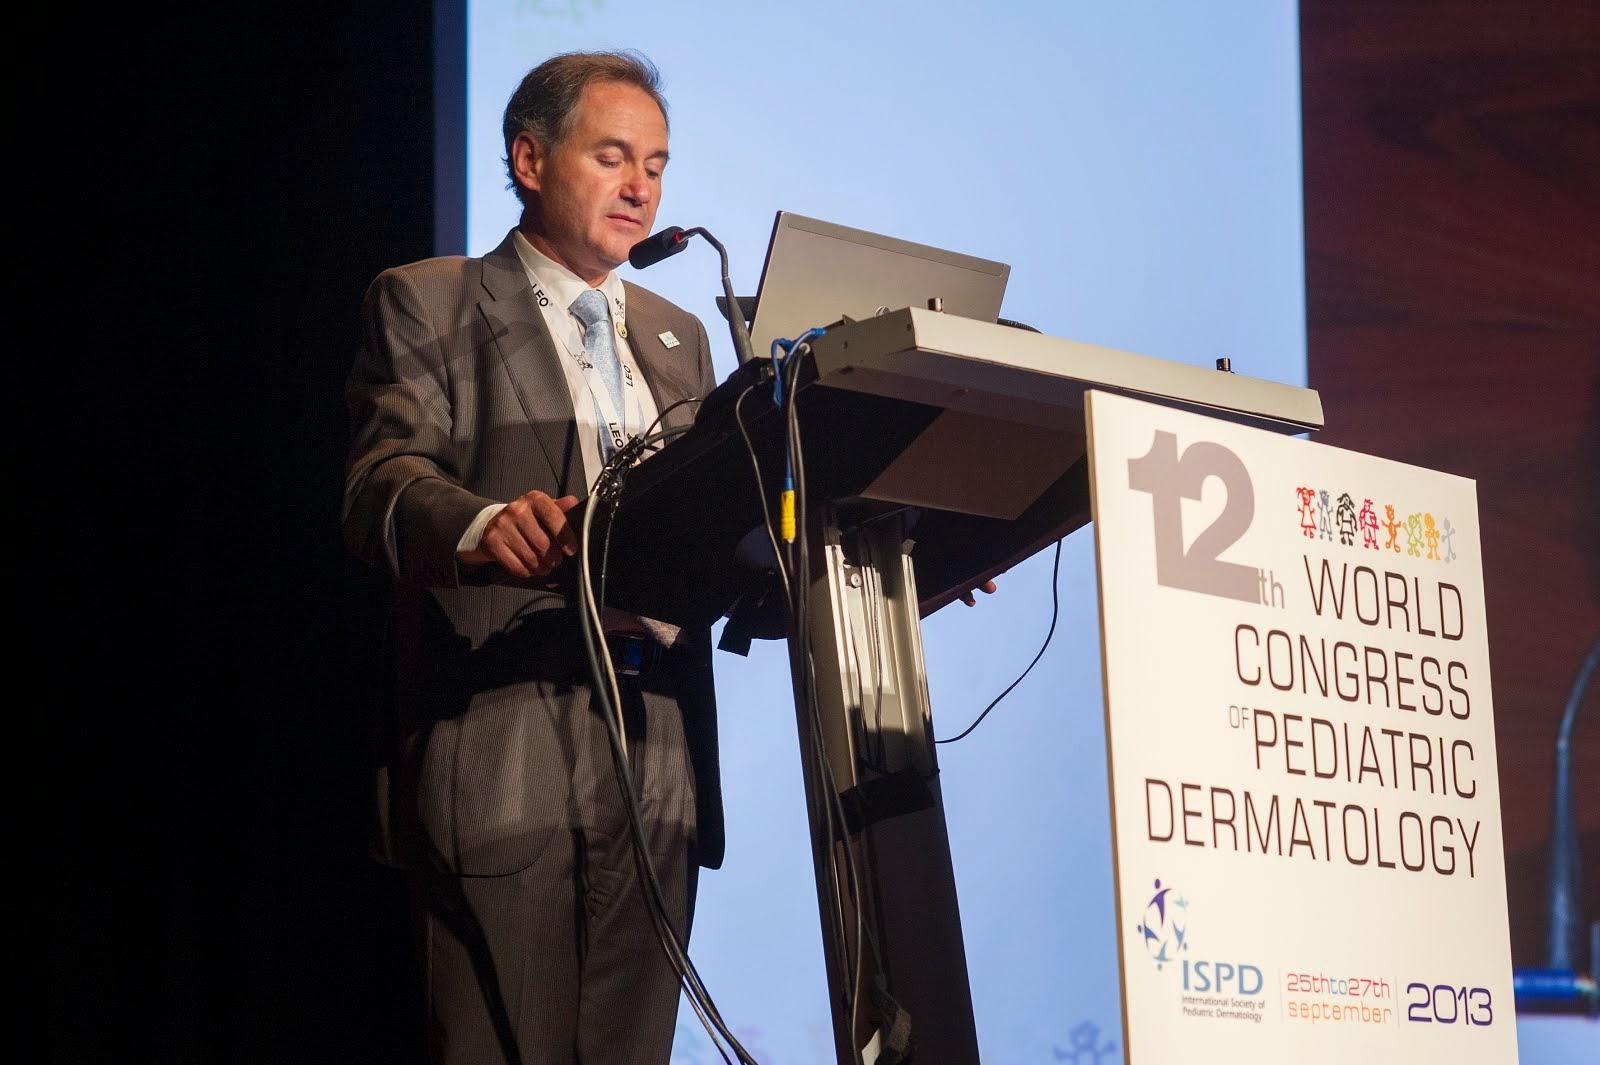 World Congress of Pediatric Dermatology